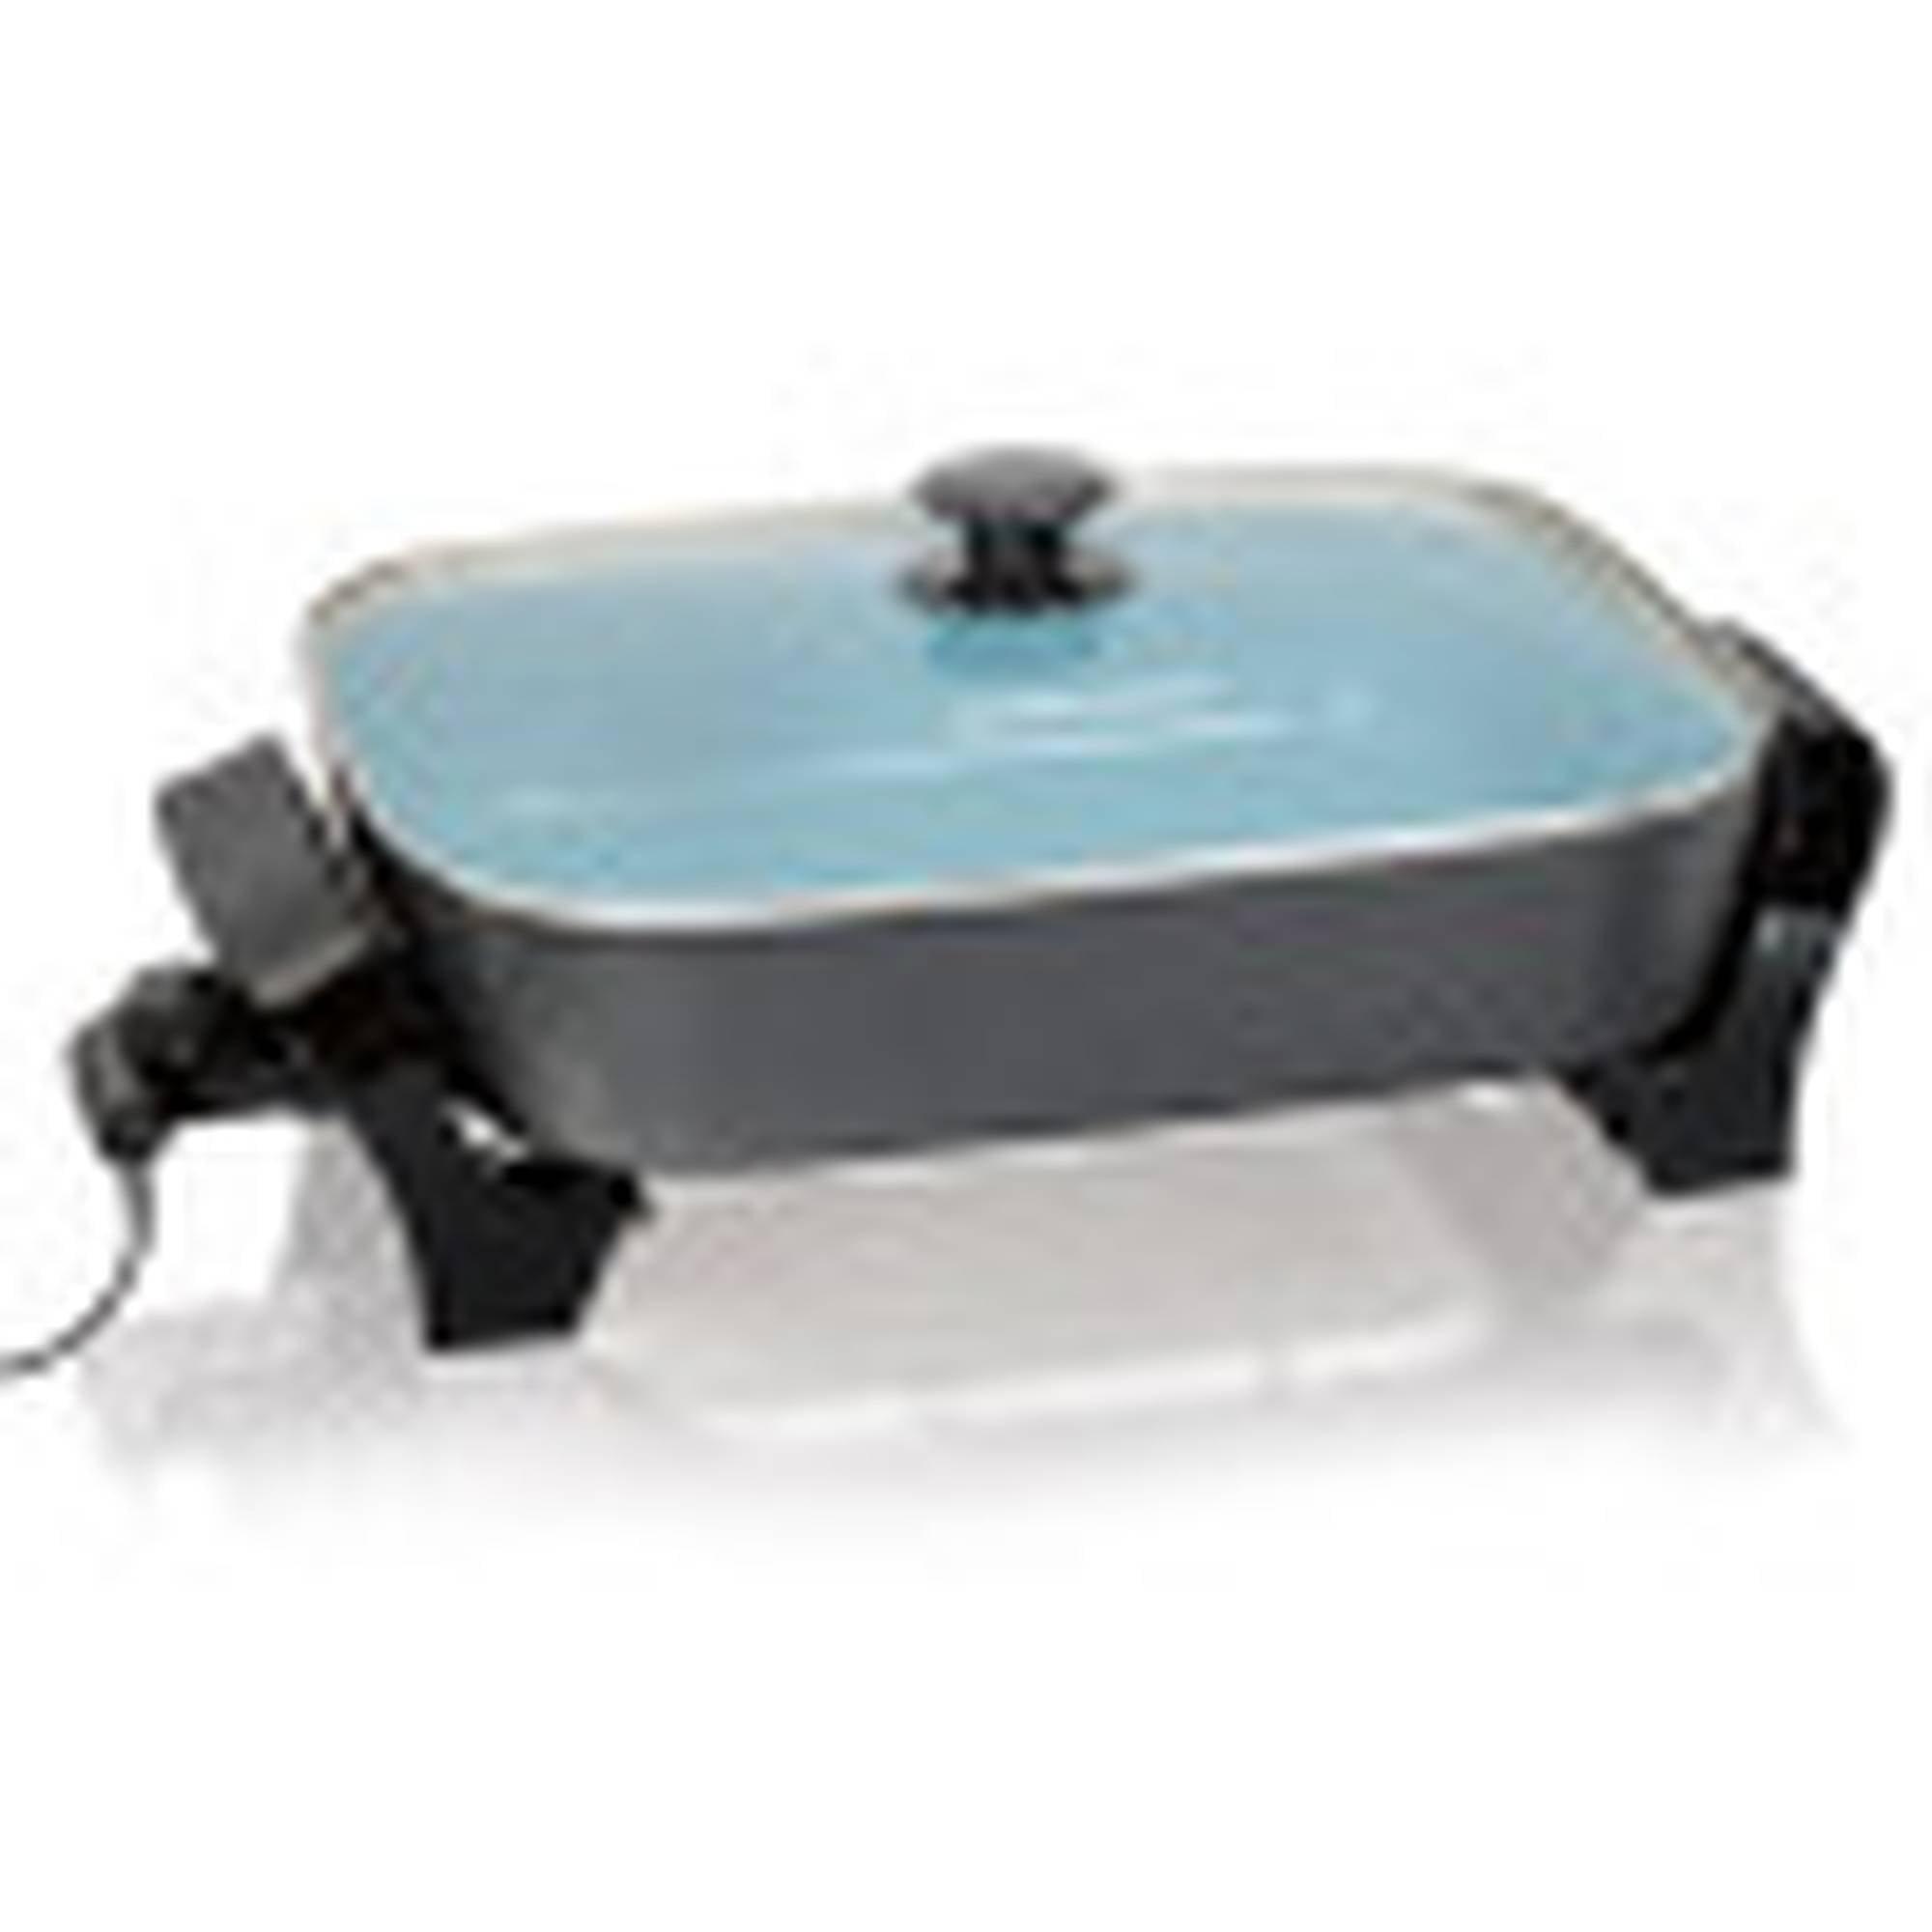 Hamilton Beach Deep Dish Ceramic Skillet, 38528 - Walmart.com